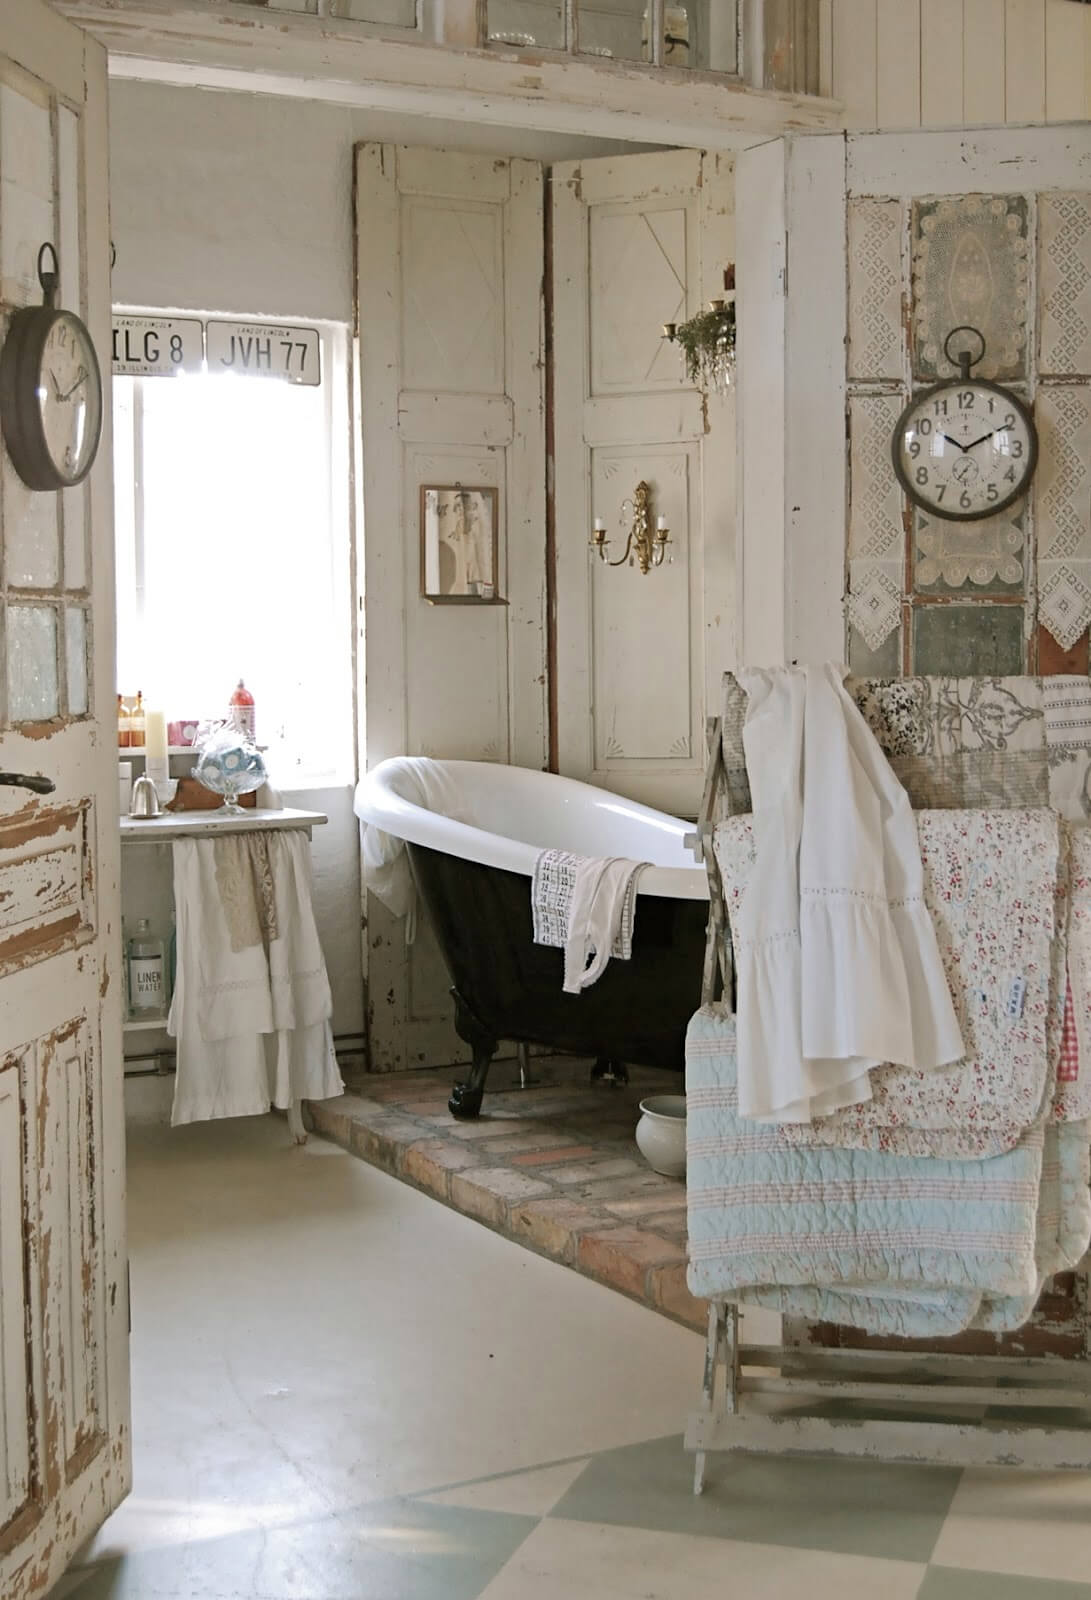 Vintage Bathroom with Quilt Rack